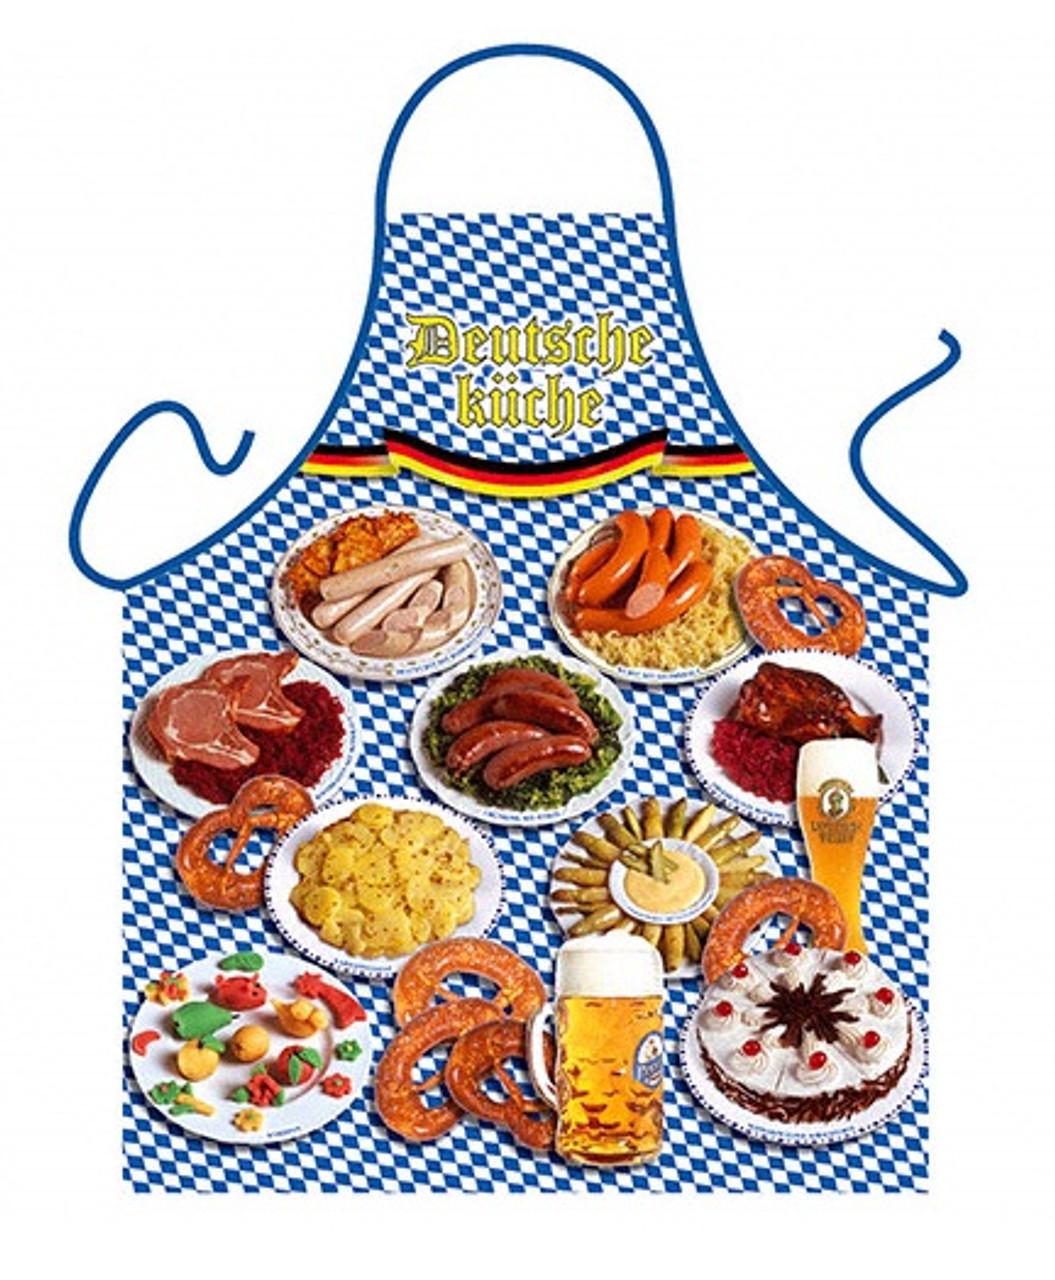 Deutsche Kuche German Cuisine Apron